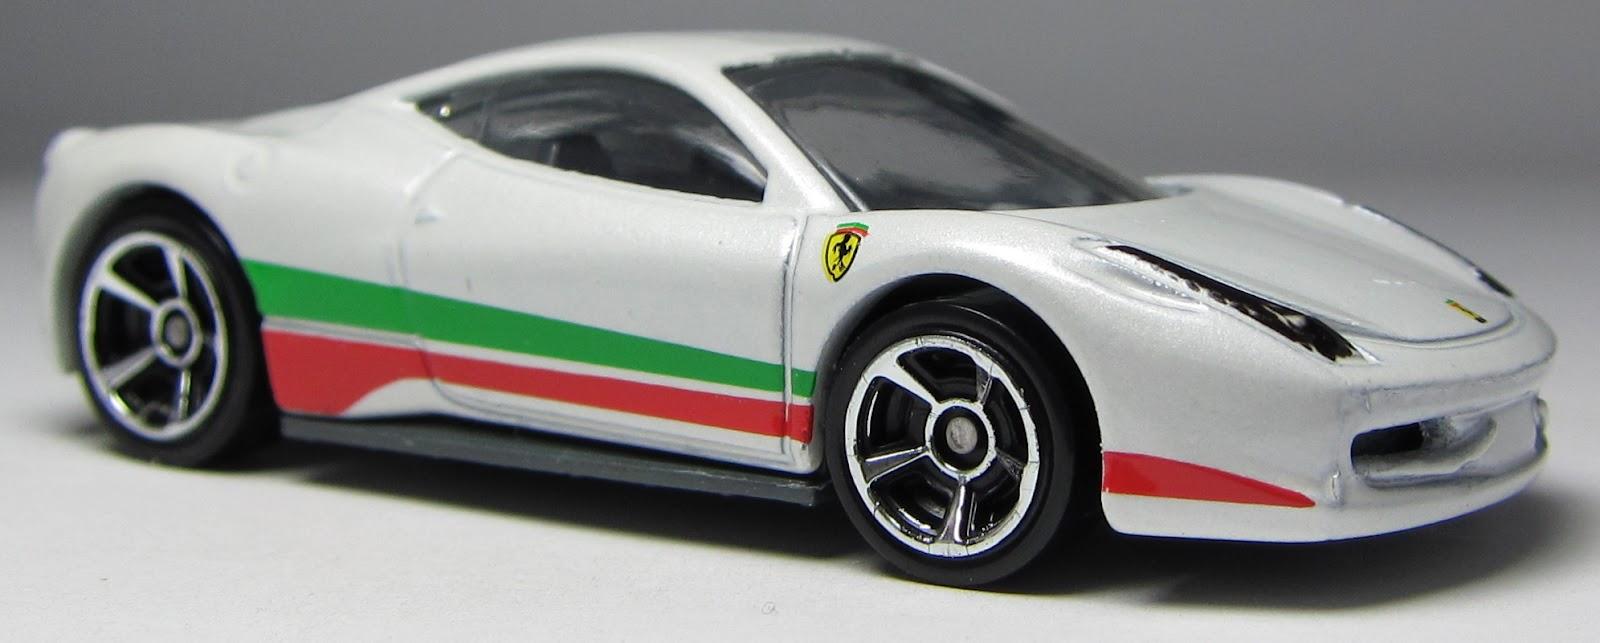 Lamley group model of the day 2012 hw ferrari 458 italia in white hot wheels ferrari 458 italia 2012 version vanachro Image collections